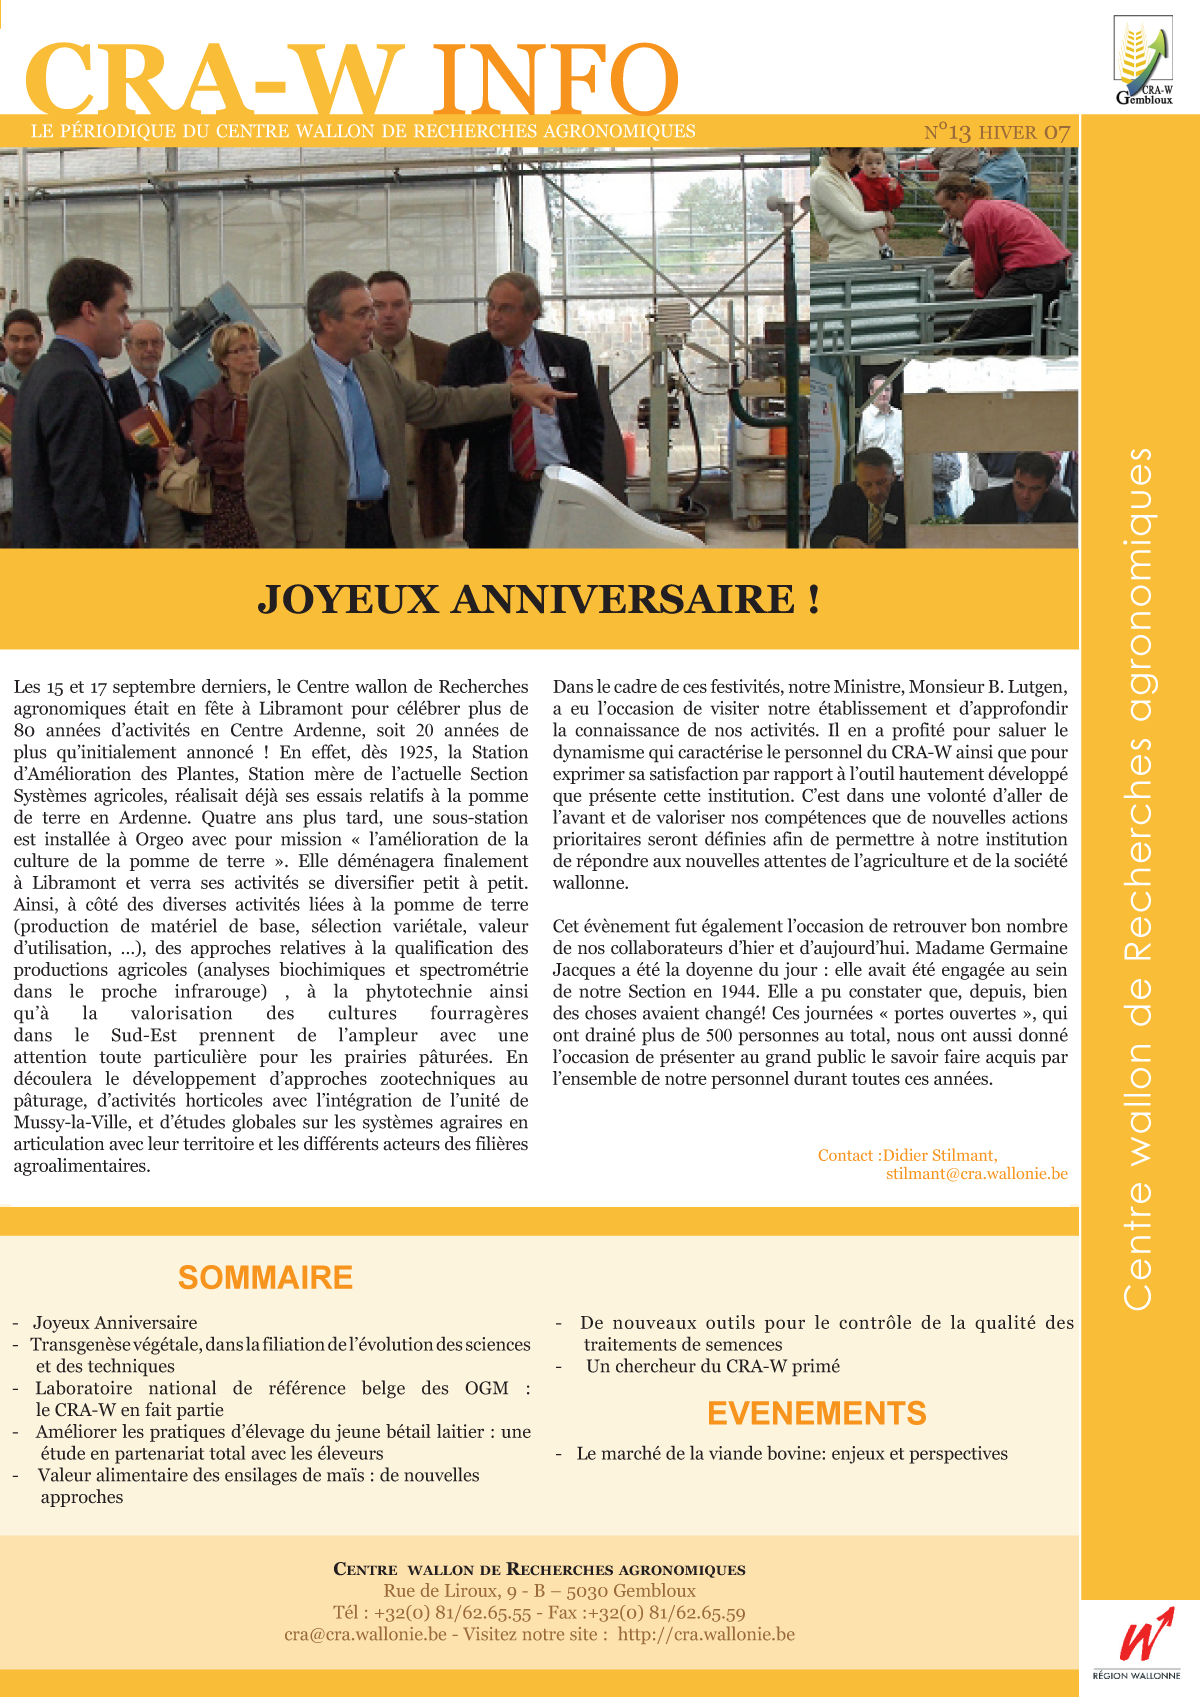 CRAW info n° 13